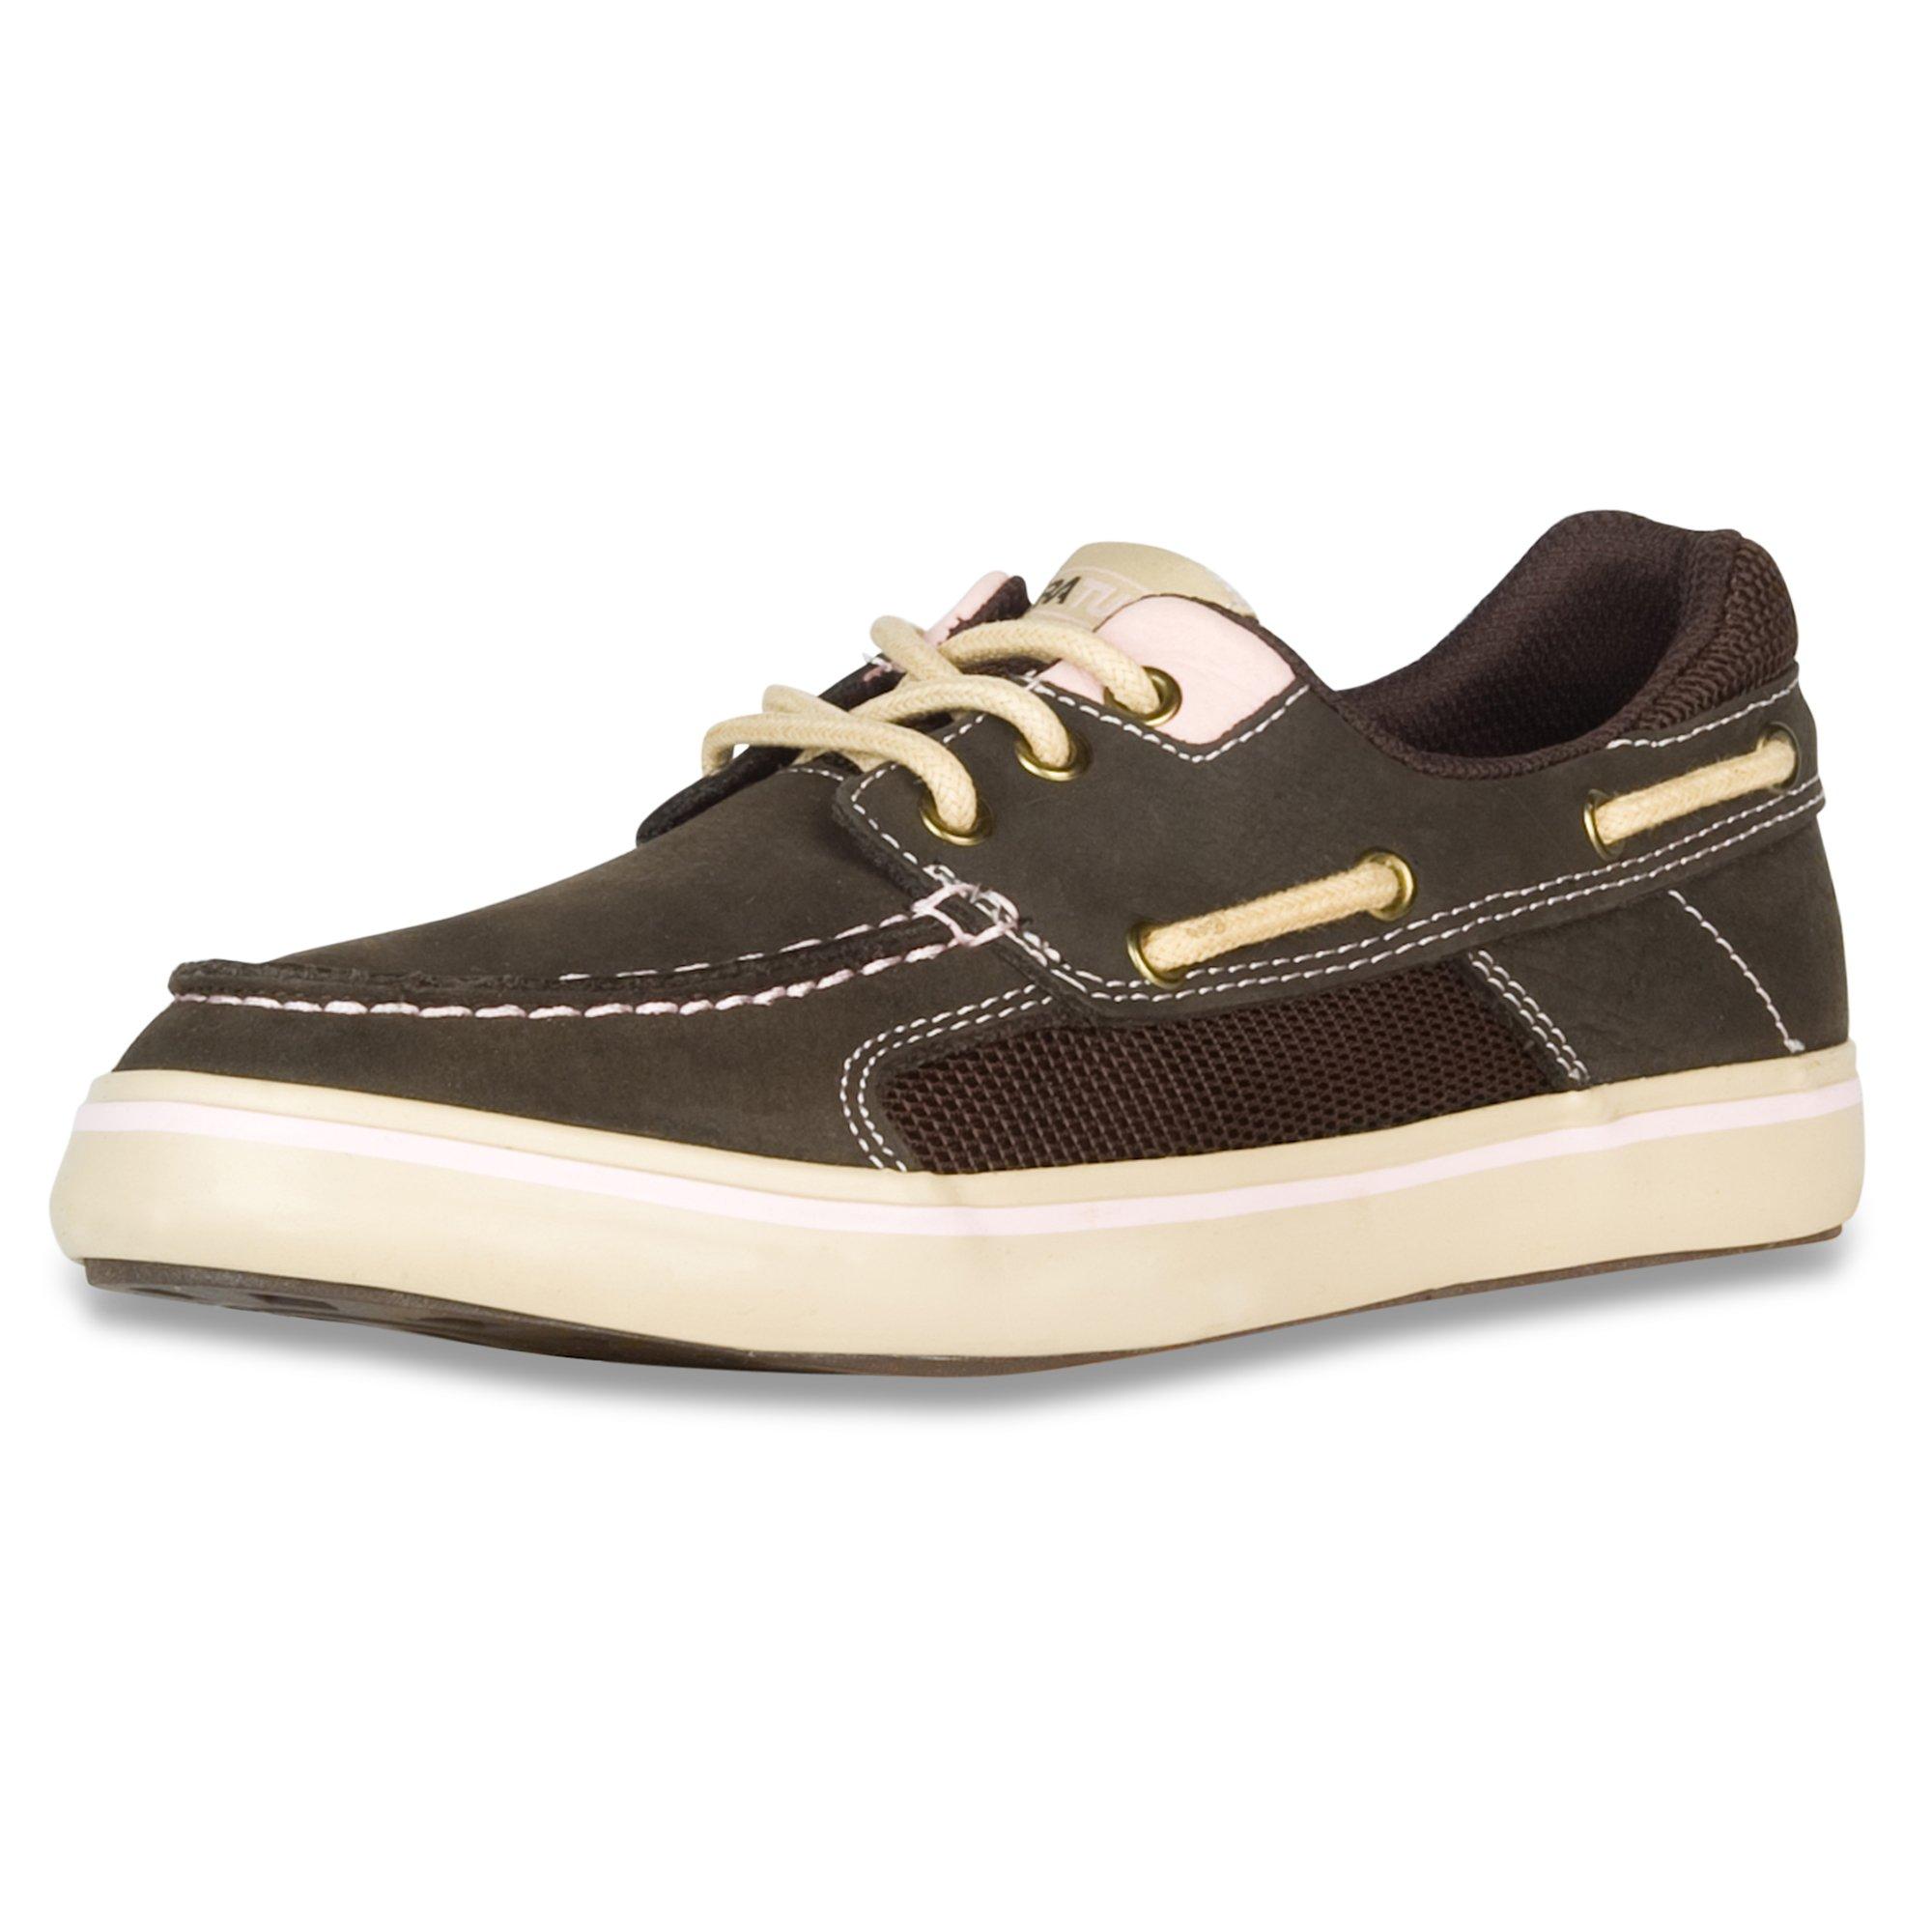 XTRATUF Finatic II Women's Leather Deck Shoes, Chocolate & Tan (22308)